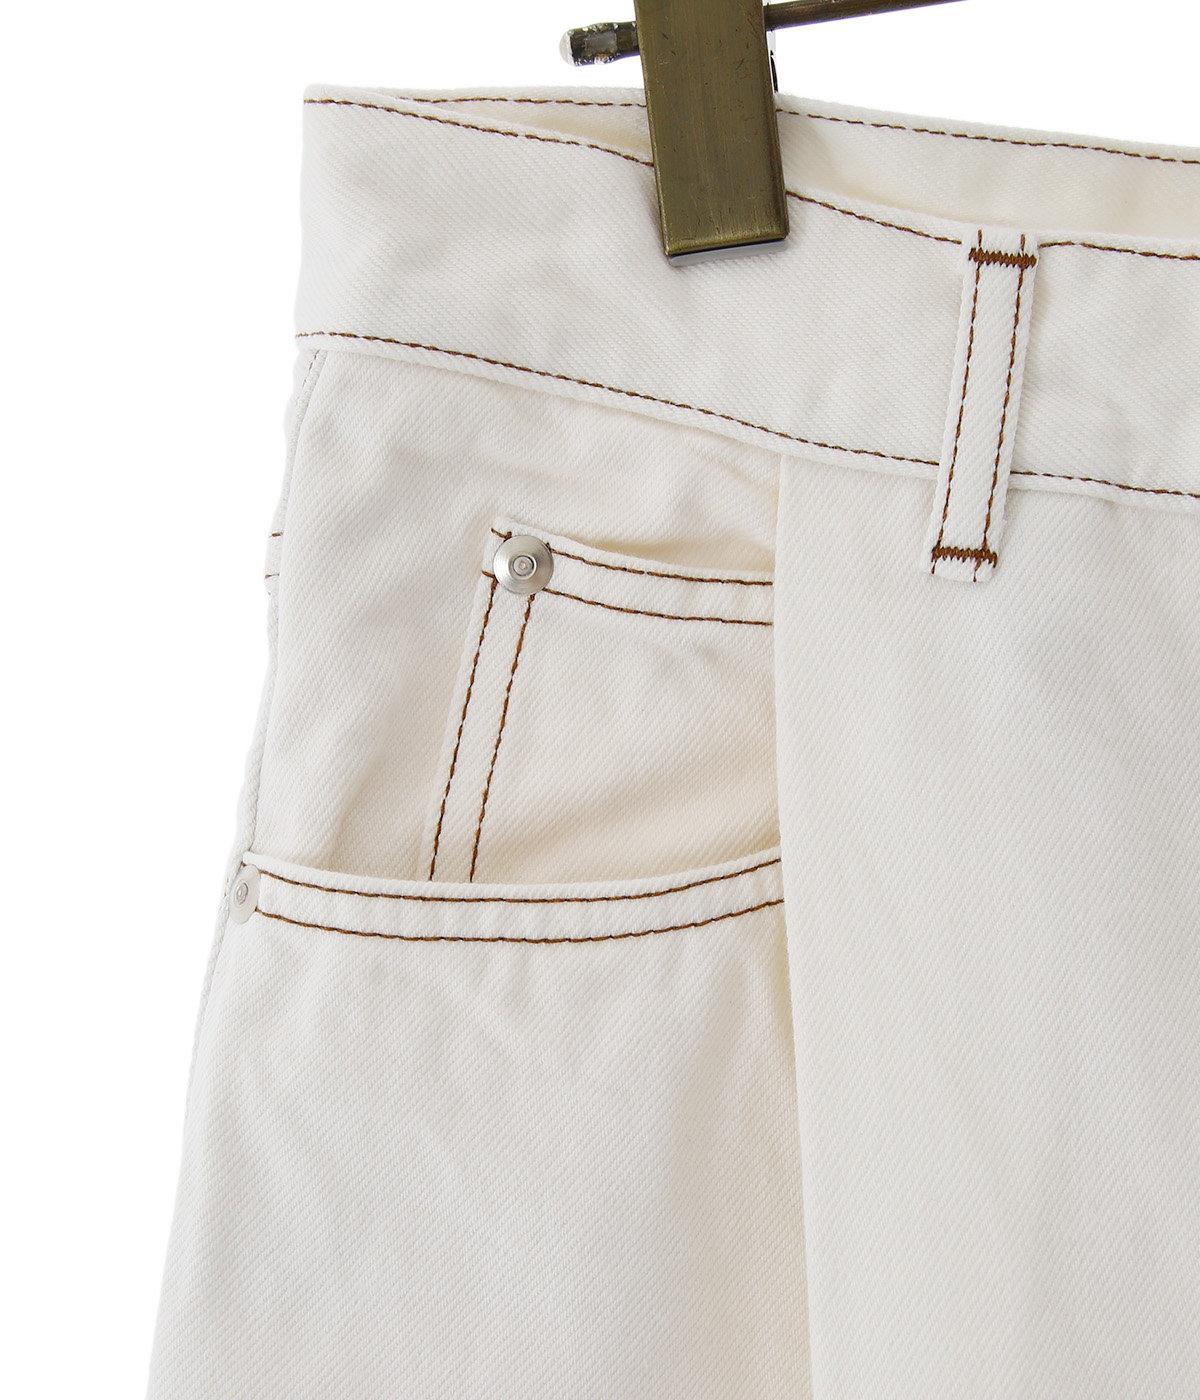 COTTON DENIM / TUCK PANTS - white -